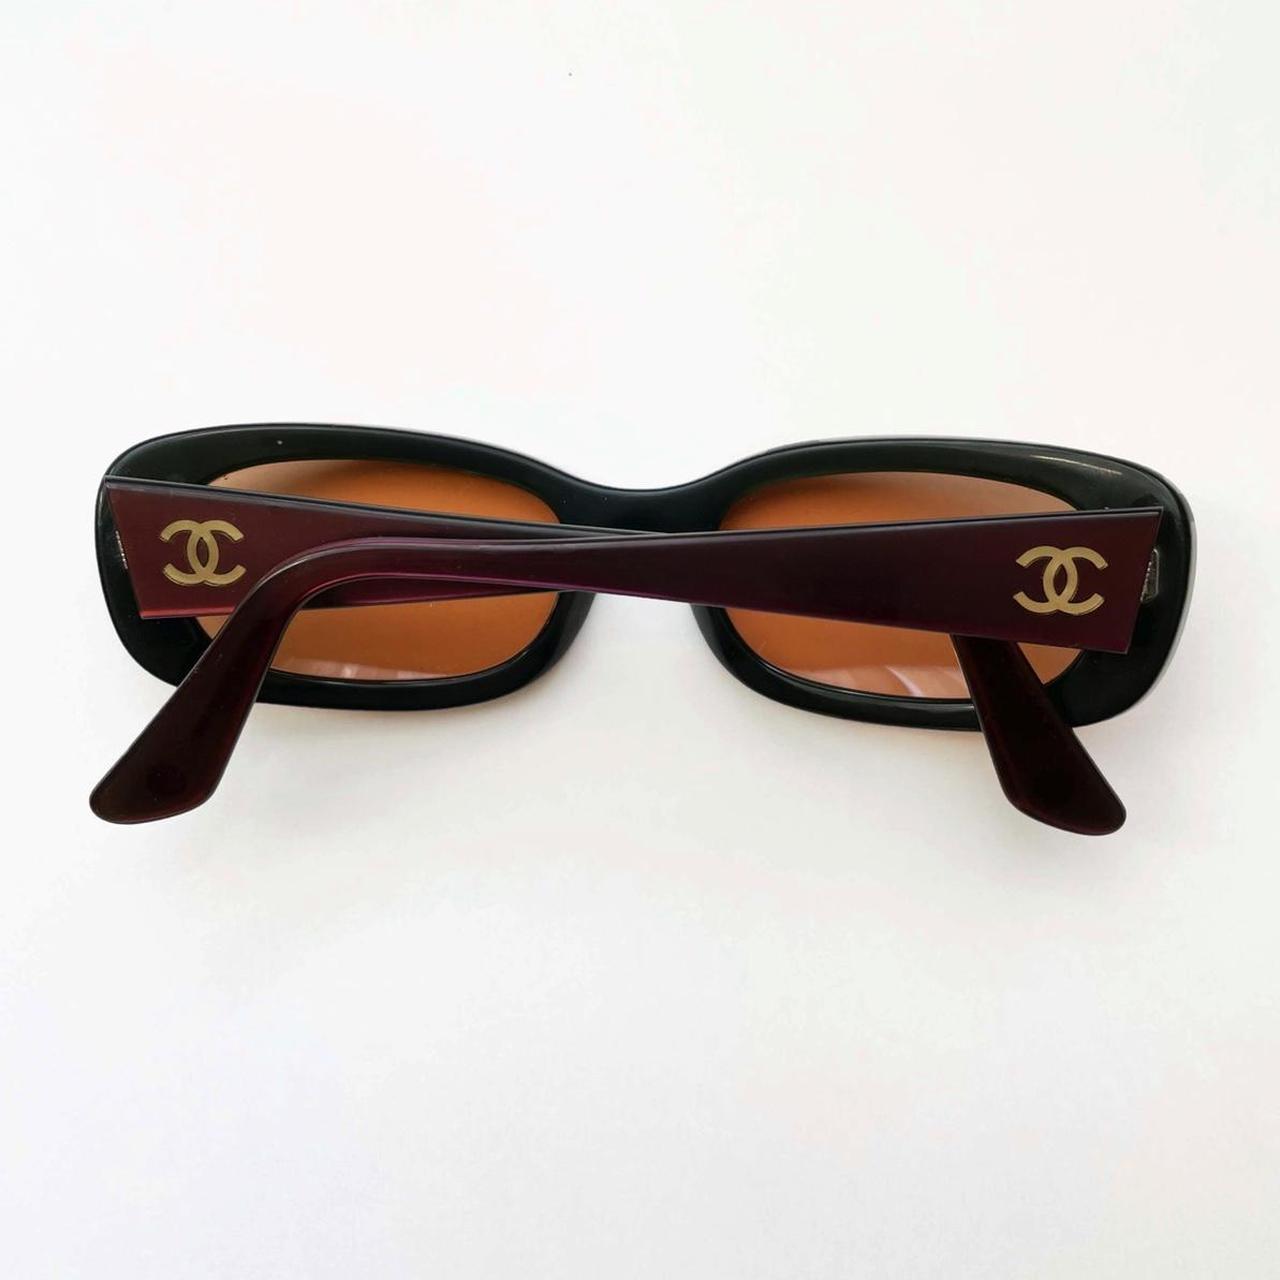 Product Image 1 - Chanel Iridescent Sunglasses  Vintage Chanel sunglasses